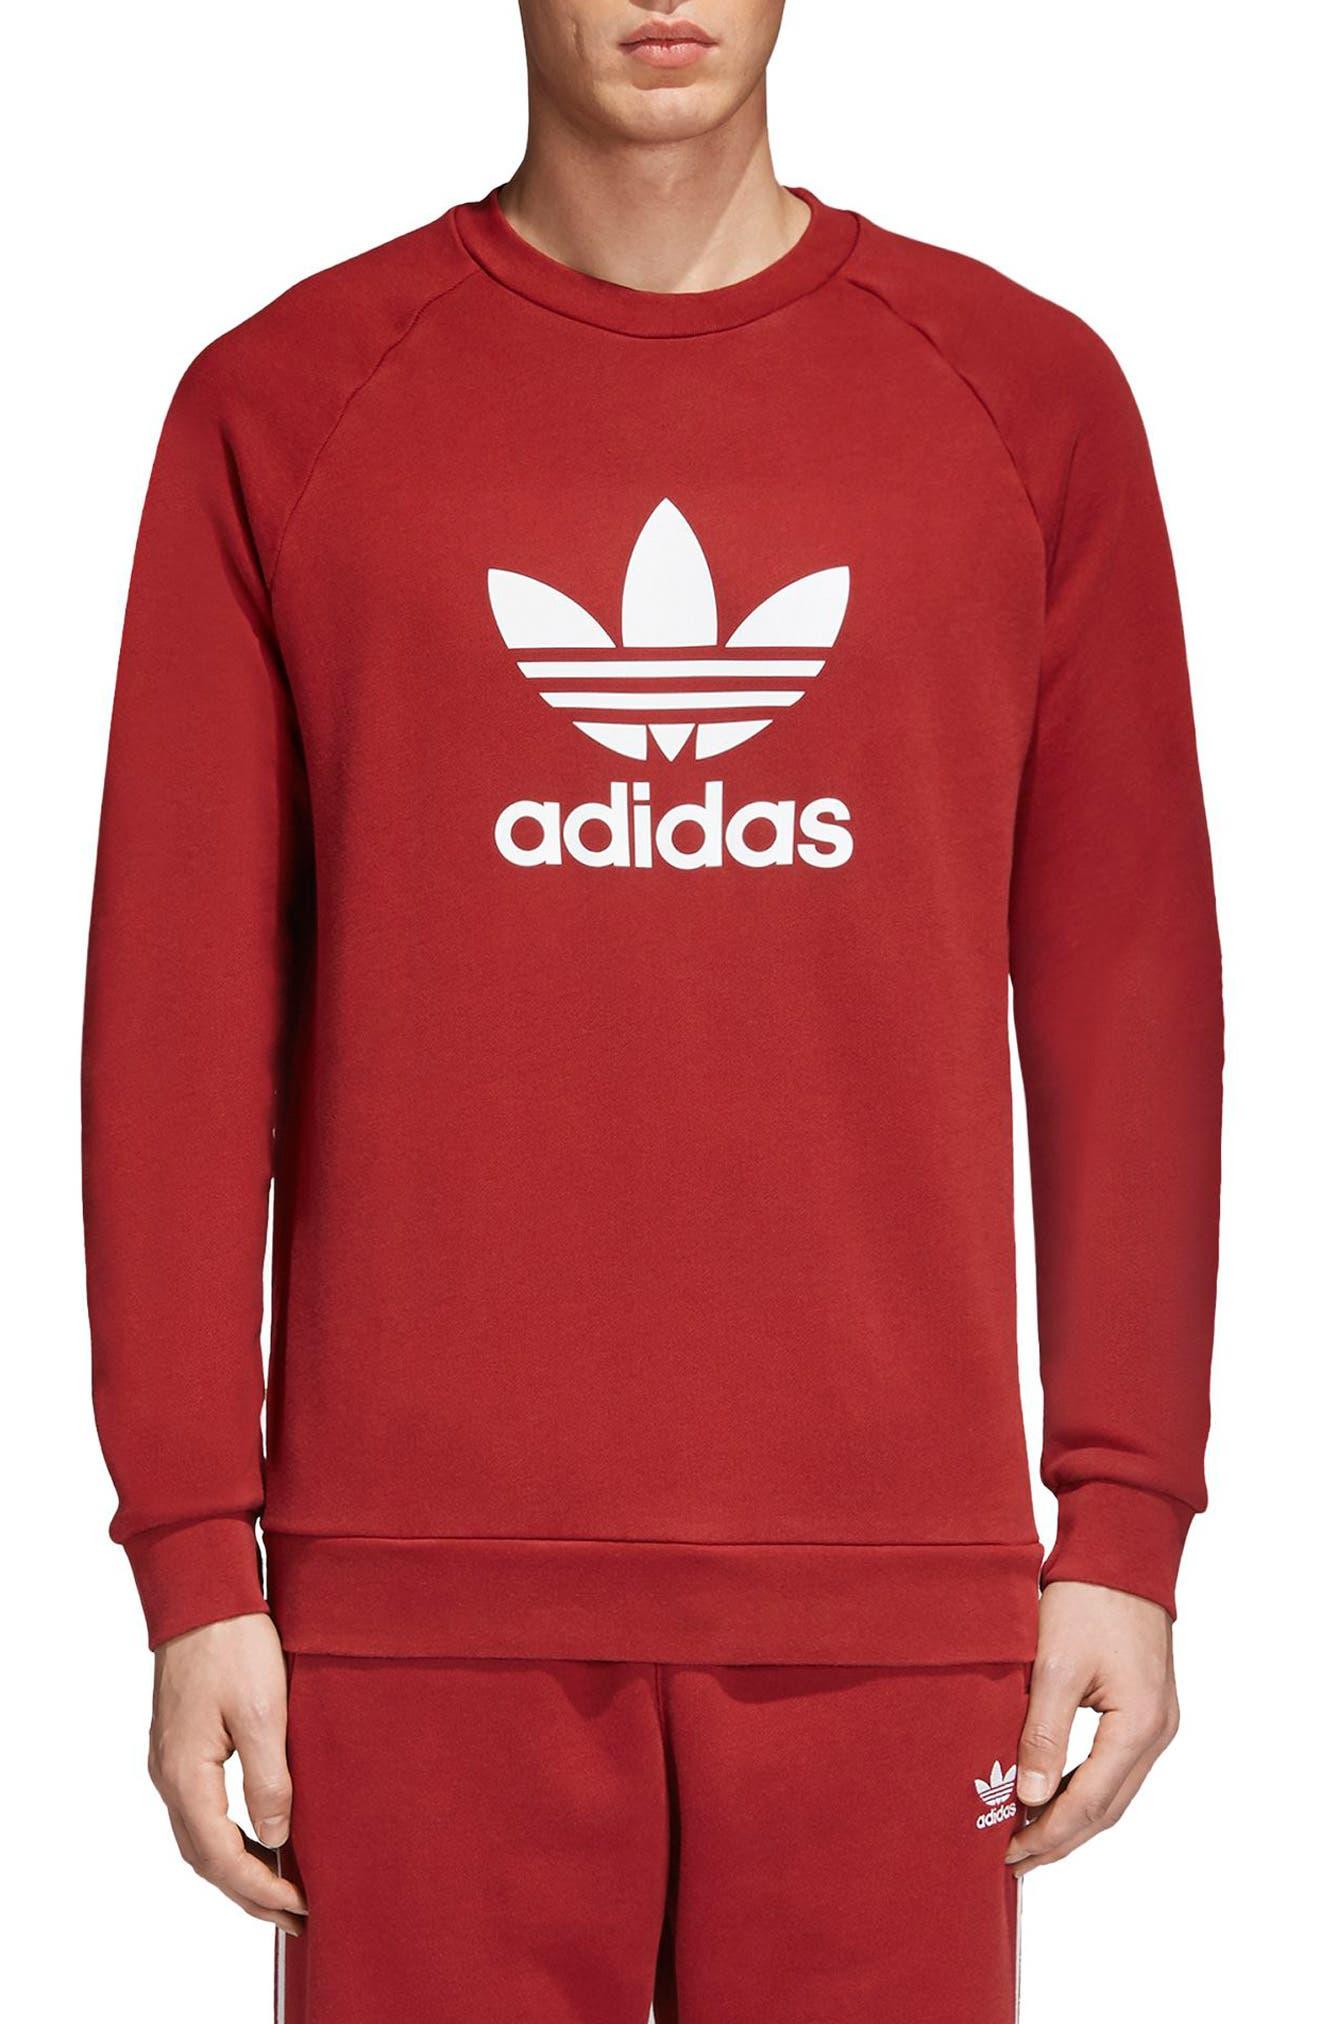 adidas Trefoil Crewneck Sweatshirt,                             Main thumbnail 1, color,                             Rusred